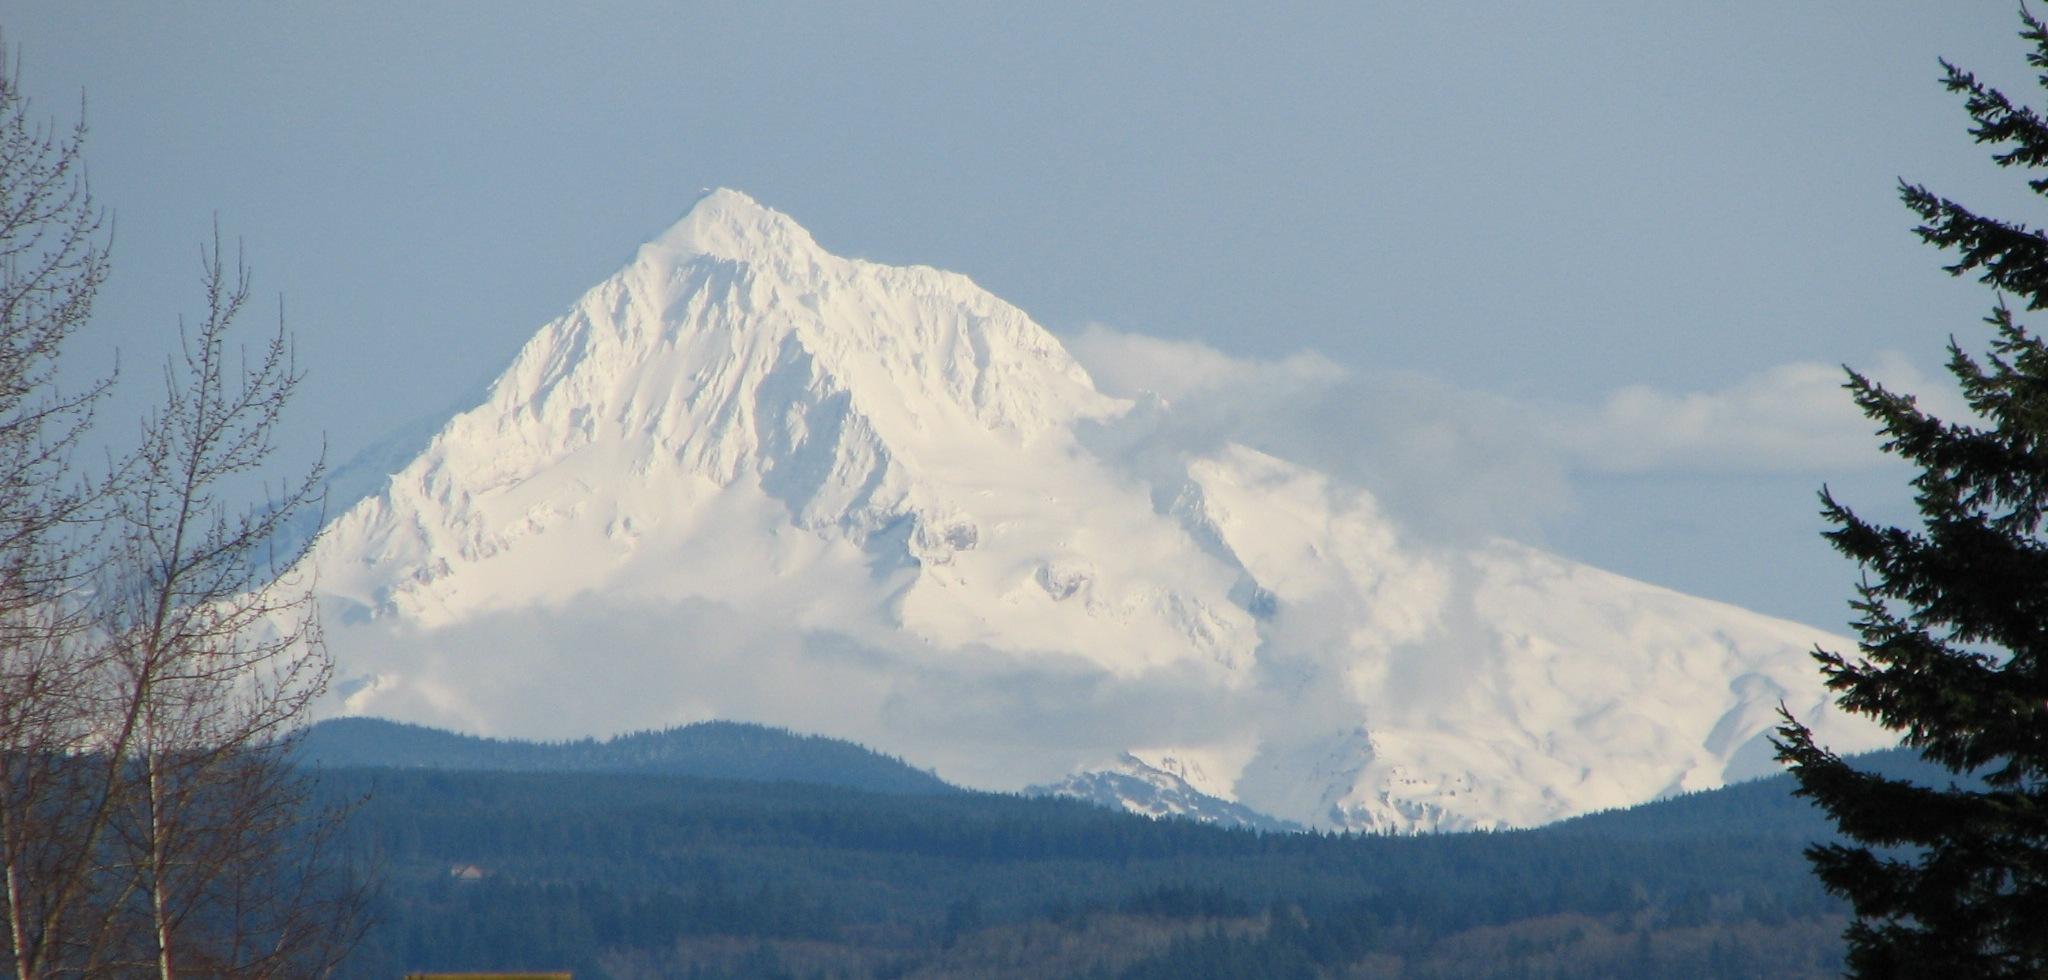 Mt. Hood. Photo by Theo.